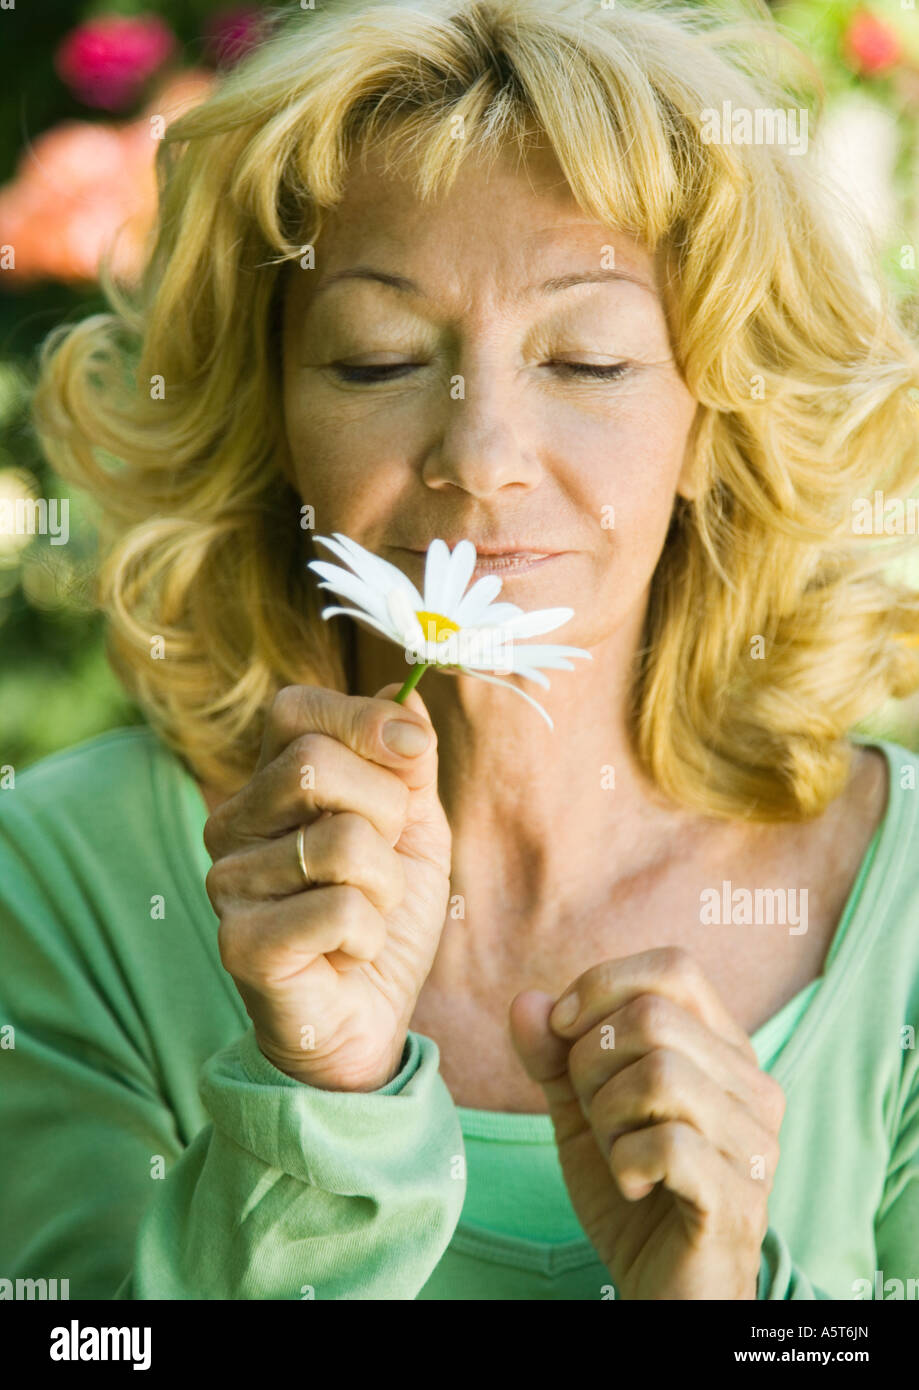 Senior woman smelling daisy - Stock Image